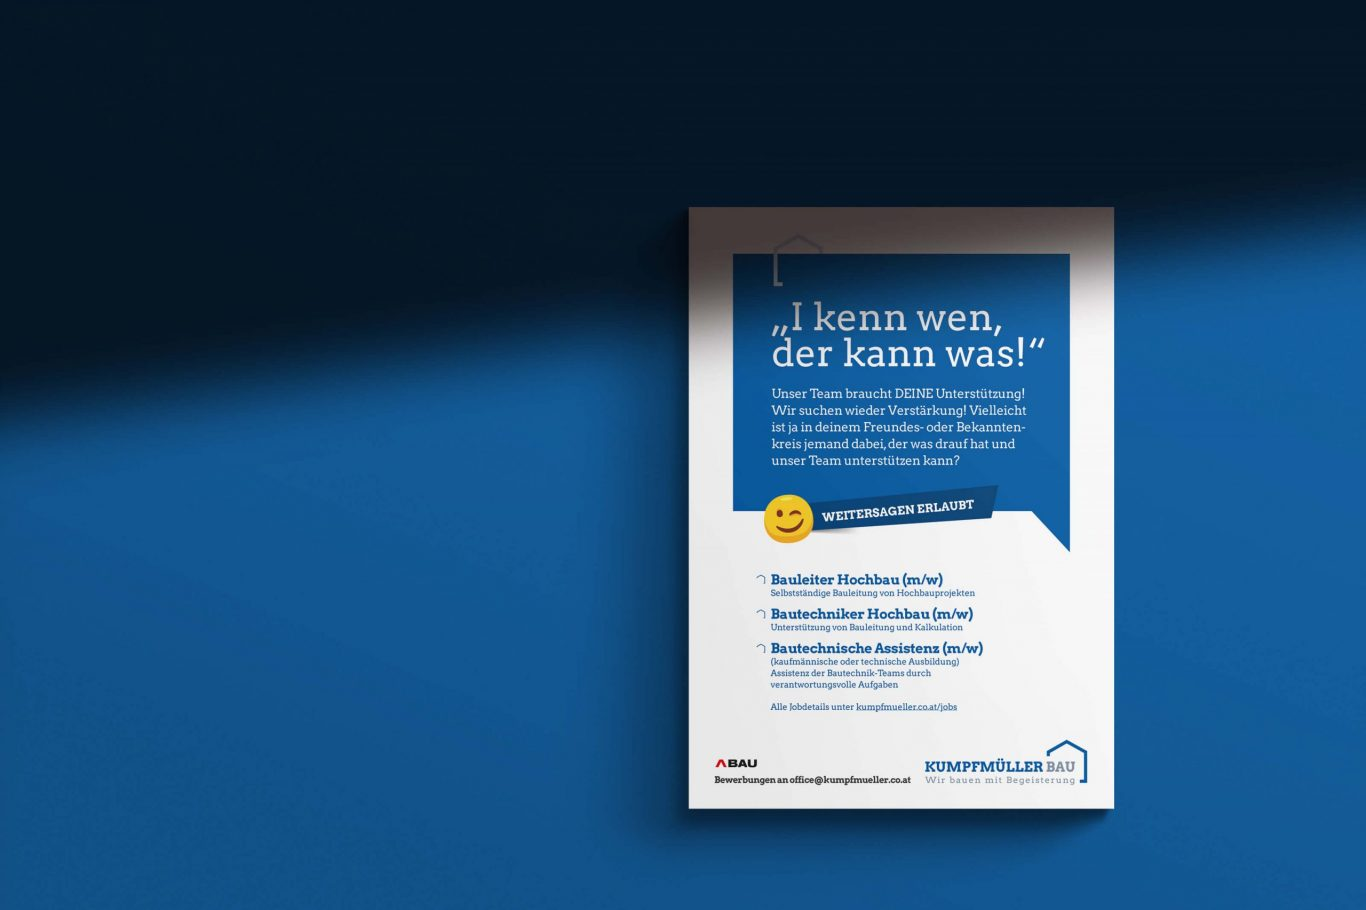 Kumpfmüller Bau Plakat